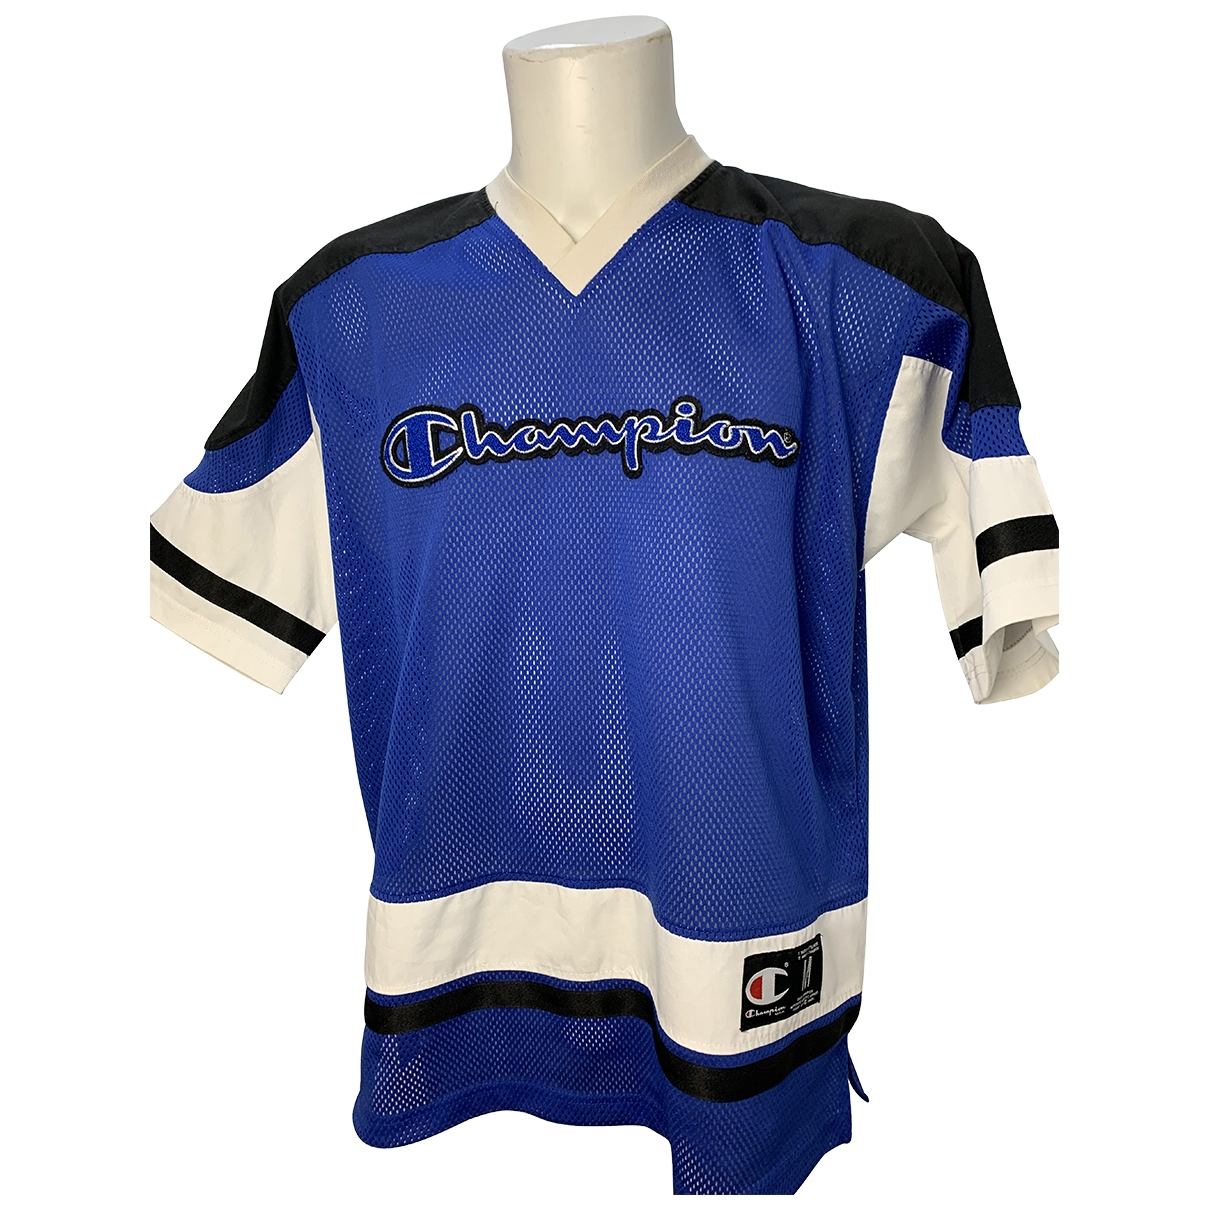 Champion - Tee shirts   pour homme - bleu